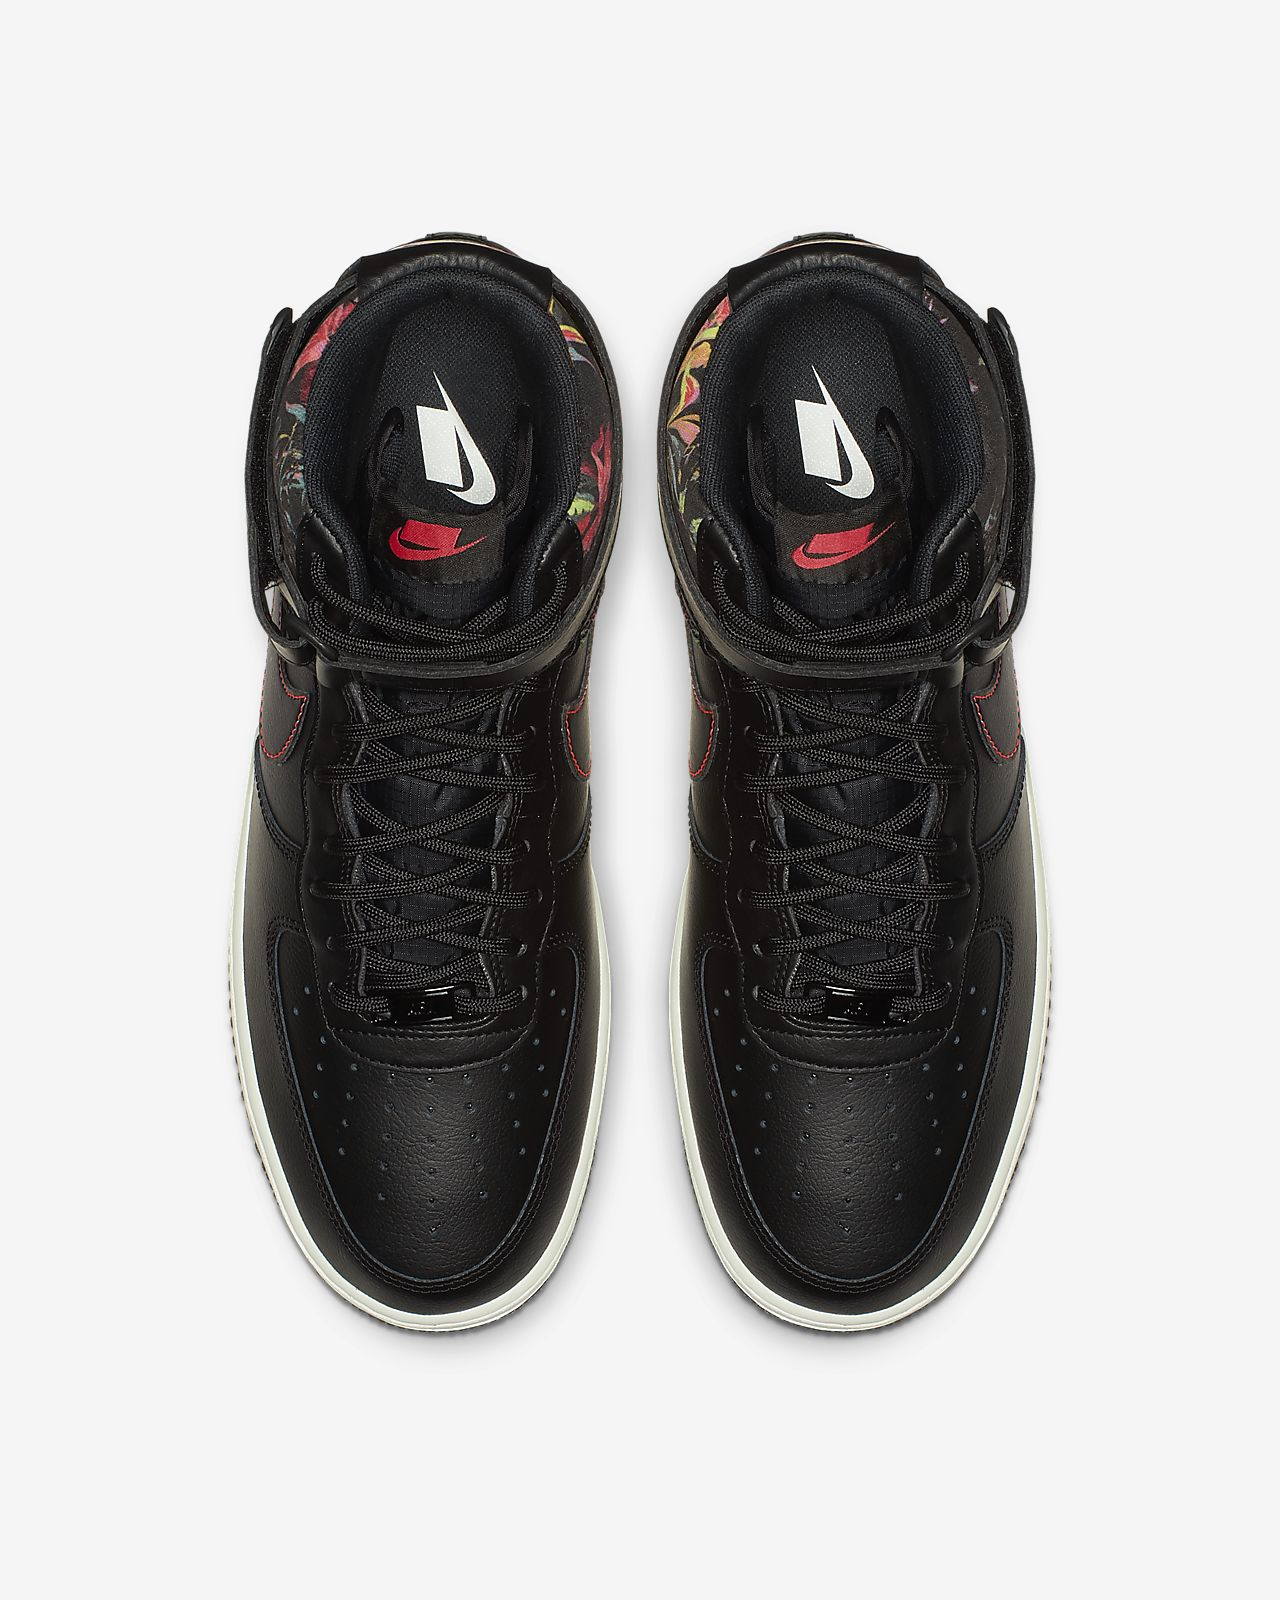 buy online 28911 3fce6 ... Nike Air Force 1 High  07 LV8 Men s Shoe